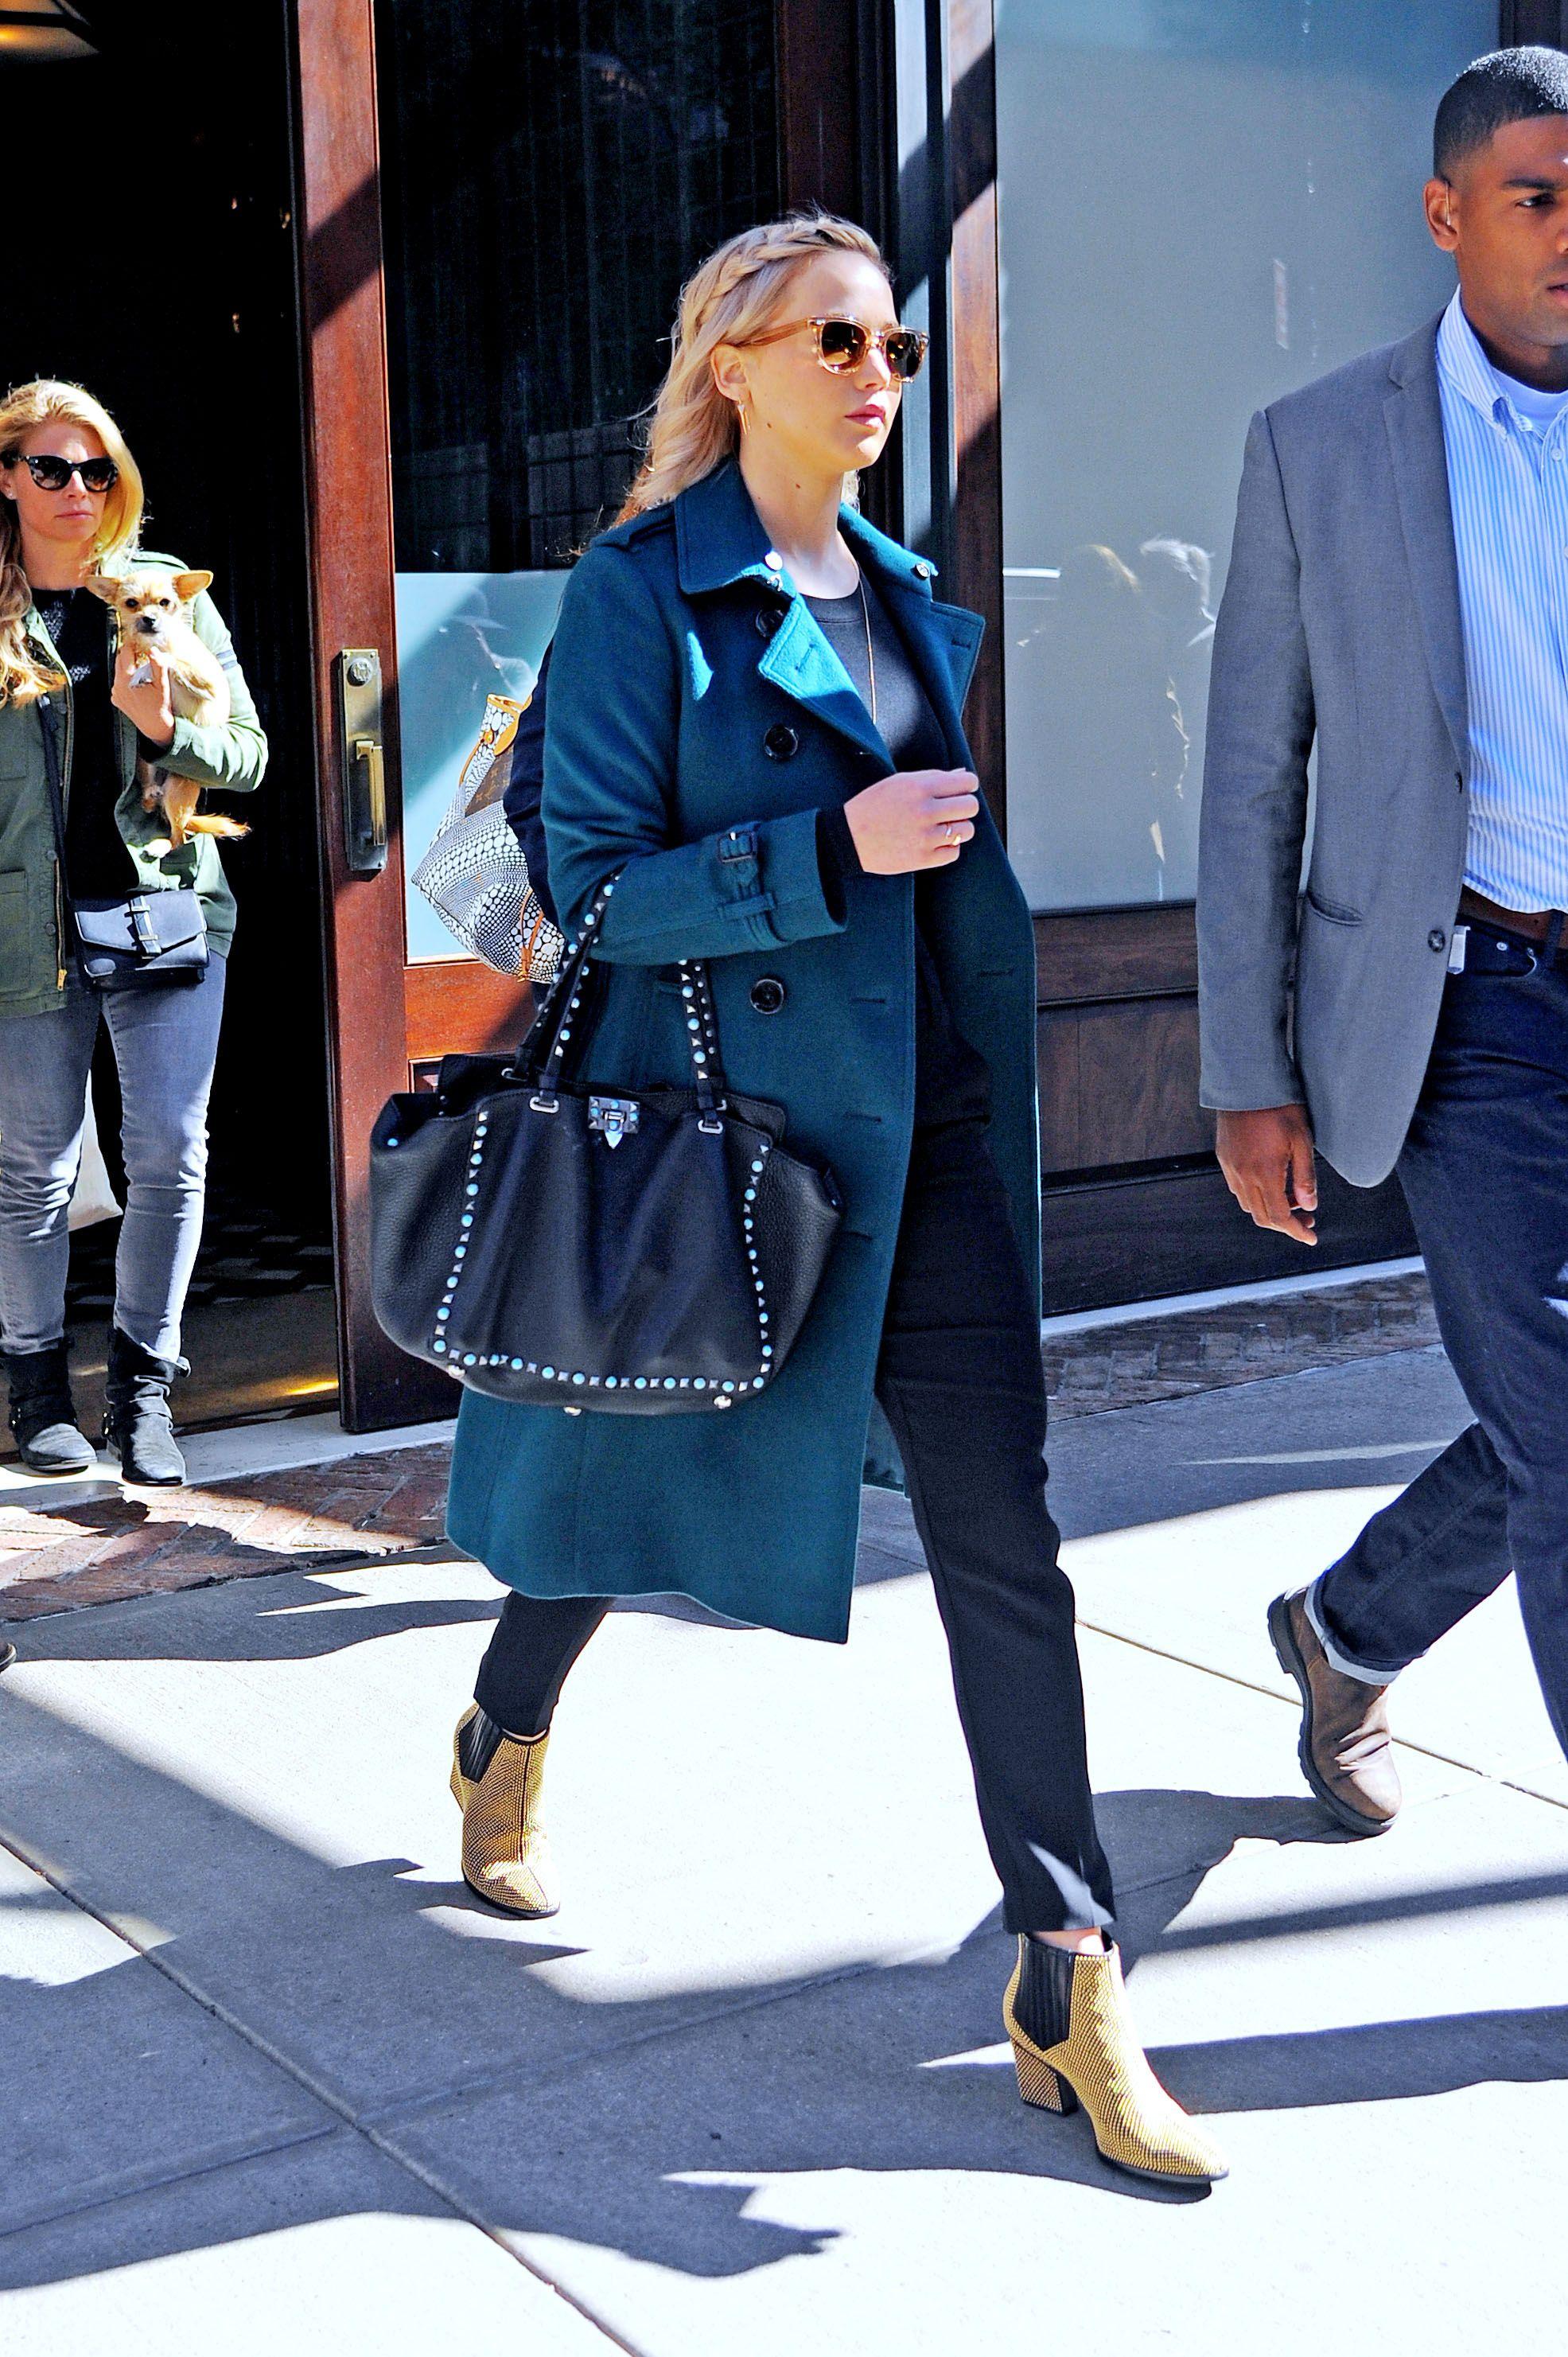 546e3096a5 Jennifer Lawrence Street Style - Jennifer Lawrence Best Looks